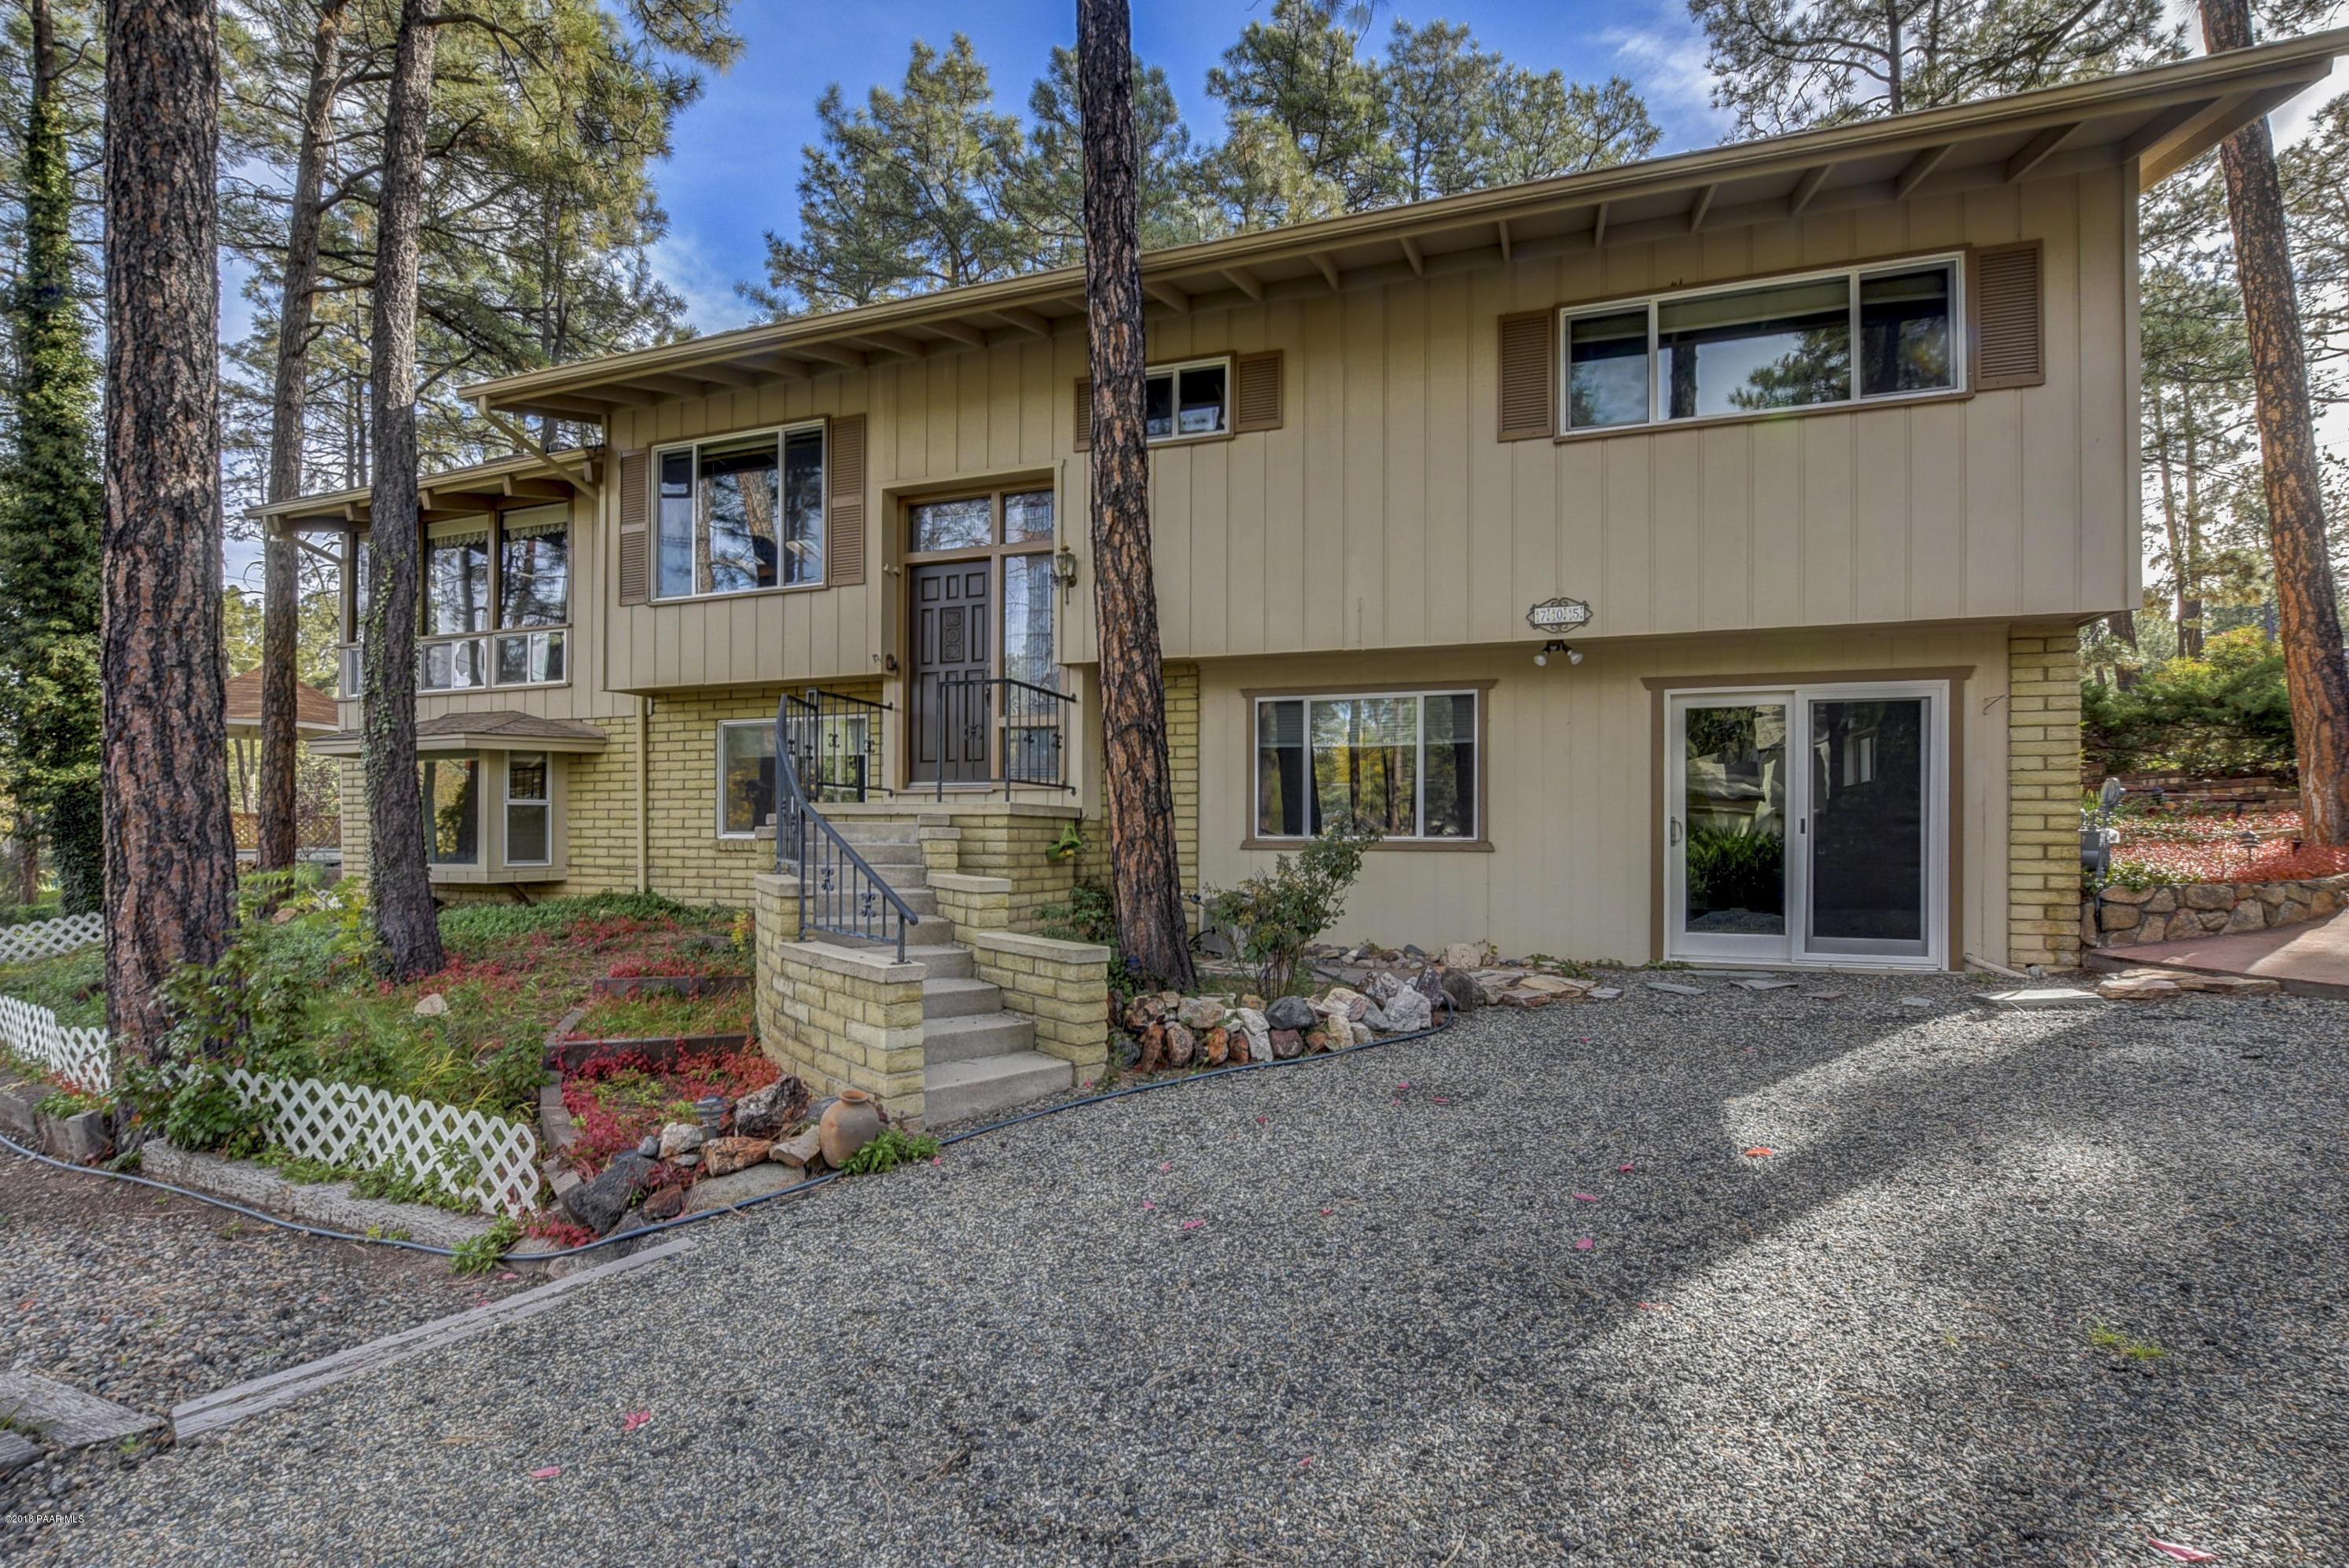 Photo of 705 Pine Knoll, Prescott, AZ 86303